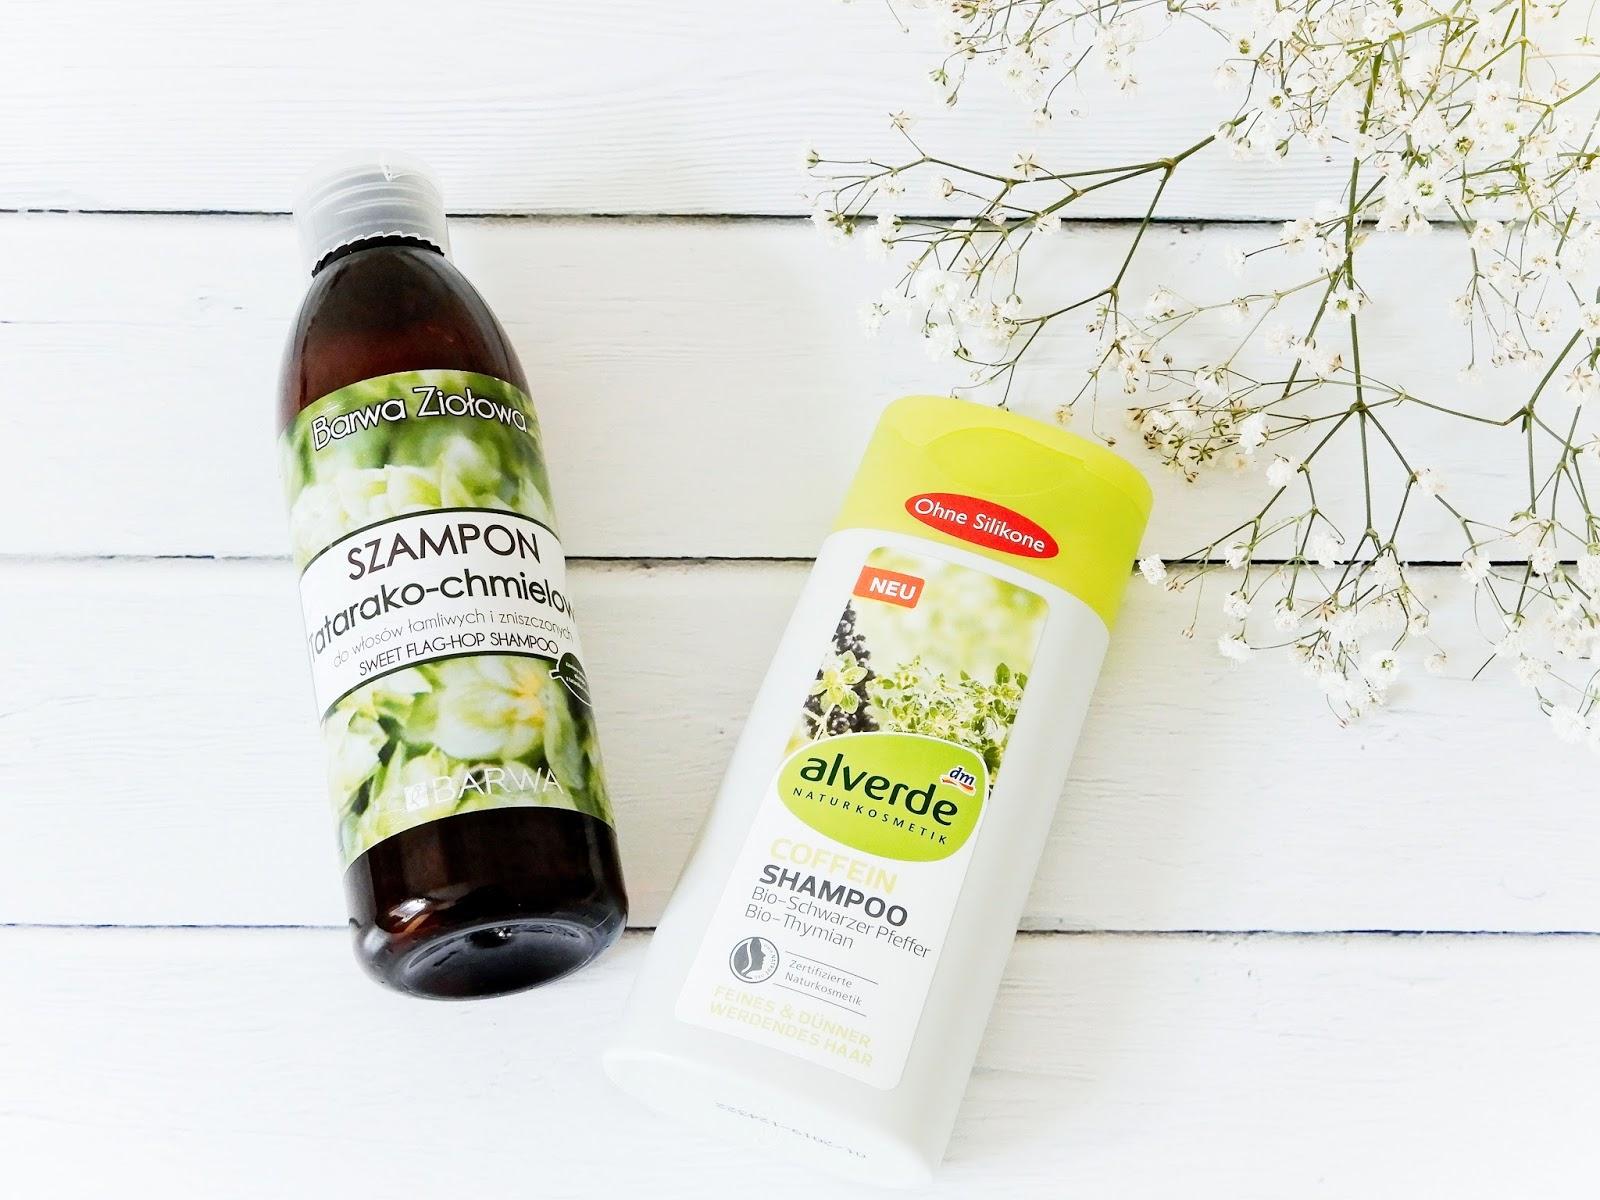 Barwa szampon tatro chmielowy, Alverde szampon kofeinowy, szampon kofeinowy, szampon Barwa, szampon Alverde,